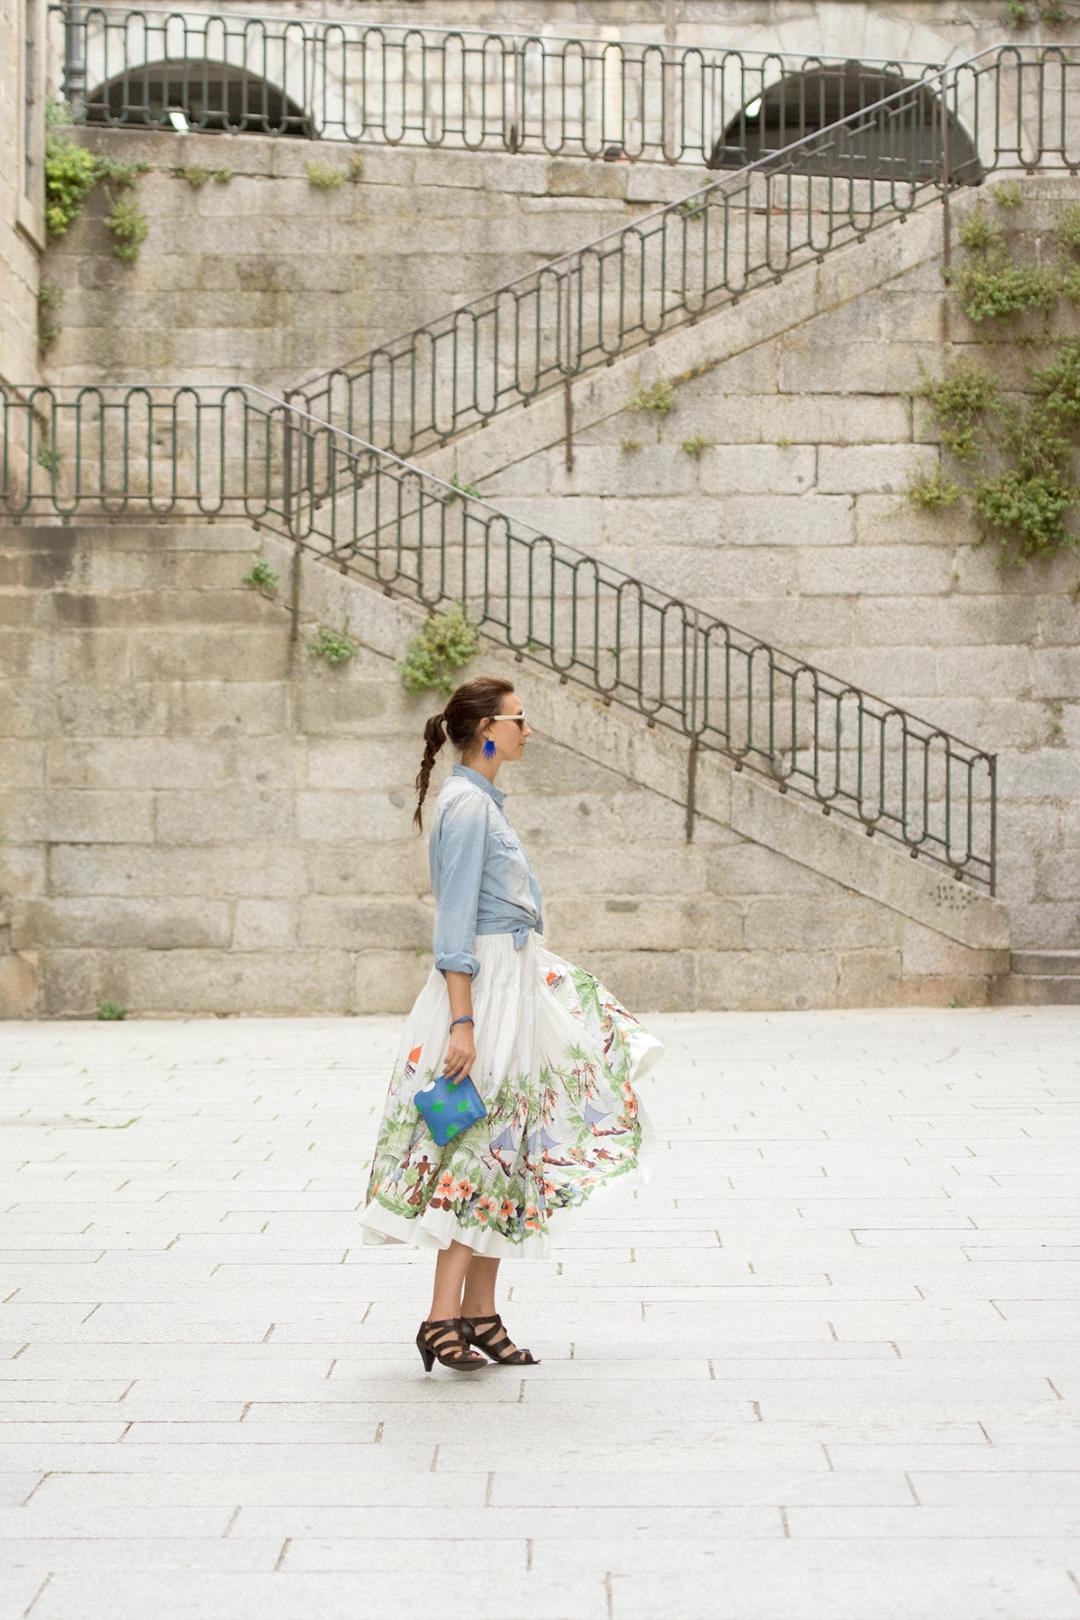 amalfi-leonor-gabala-street-style-mitmeblog-1080-11